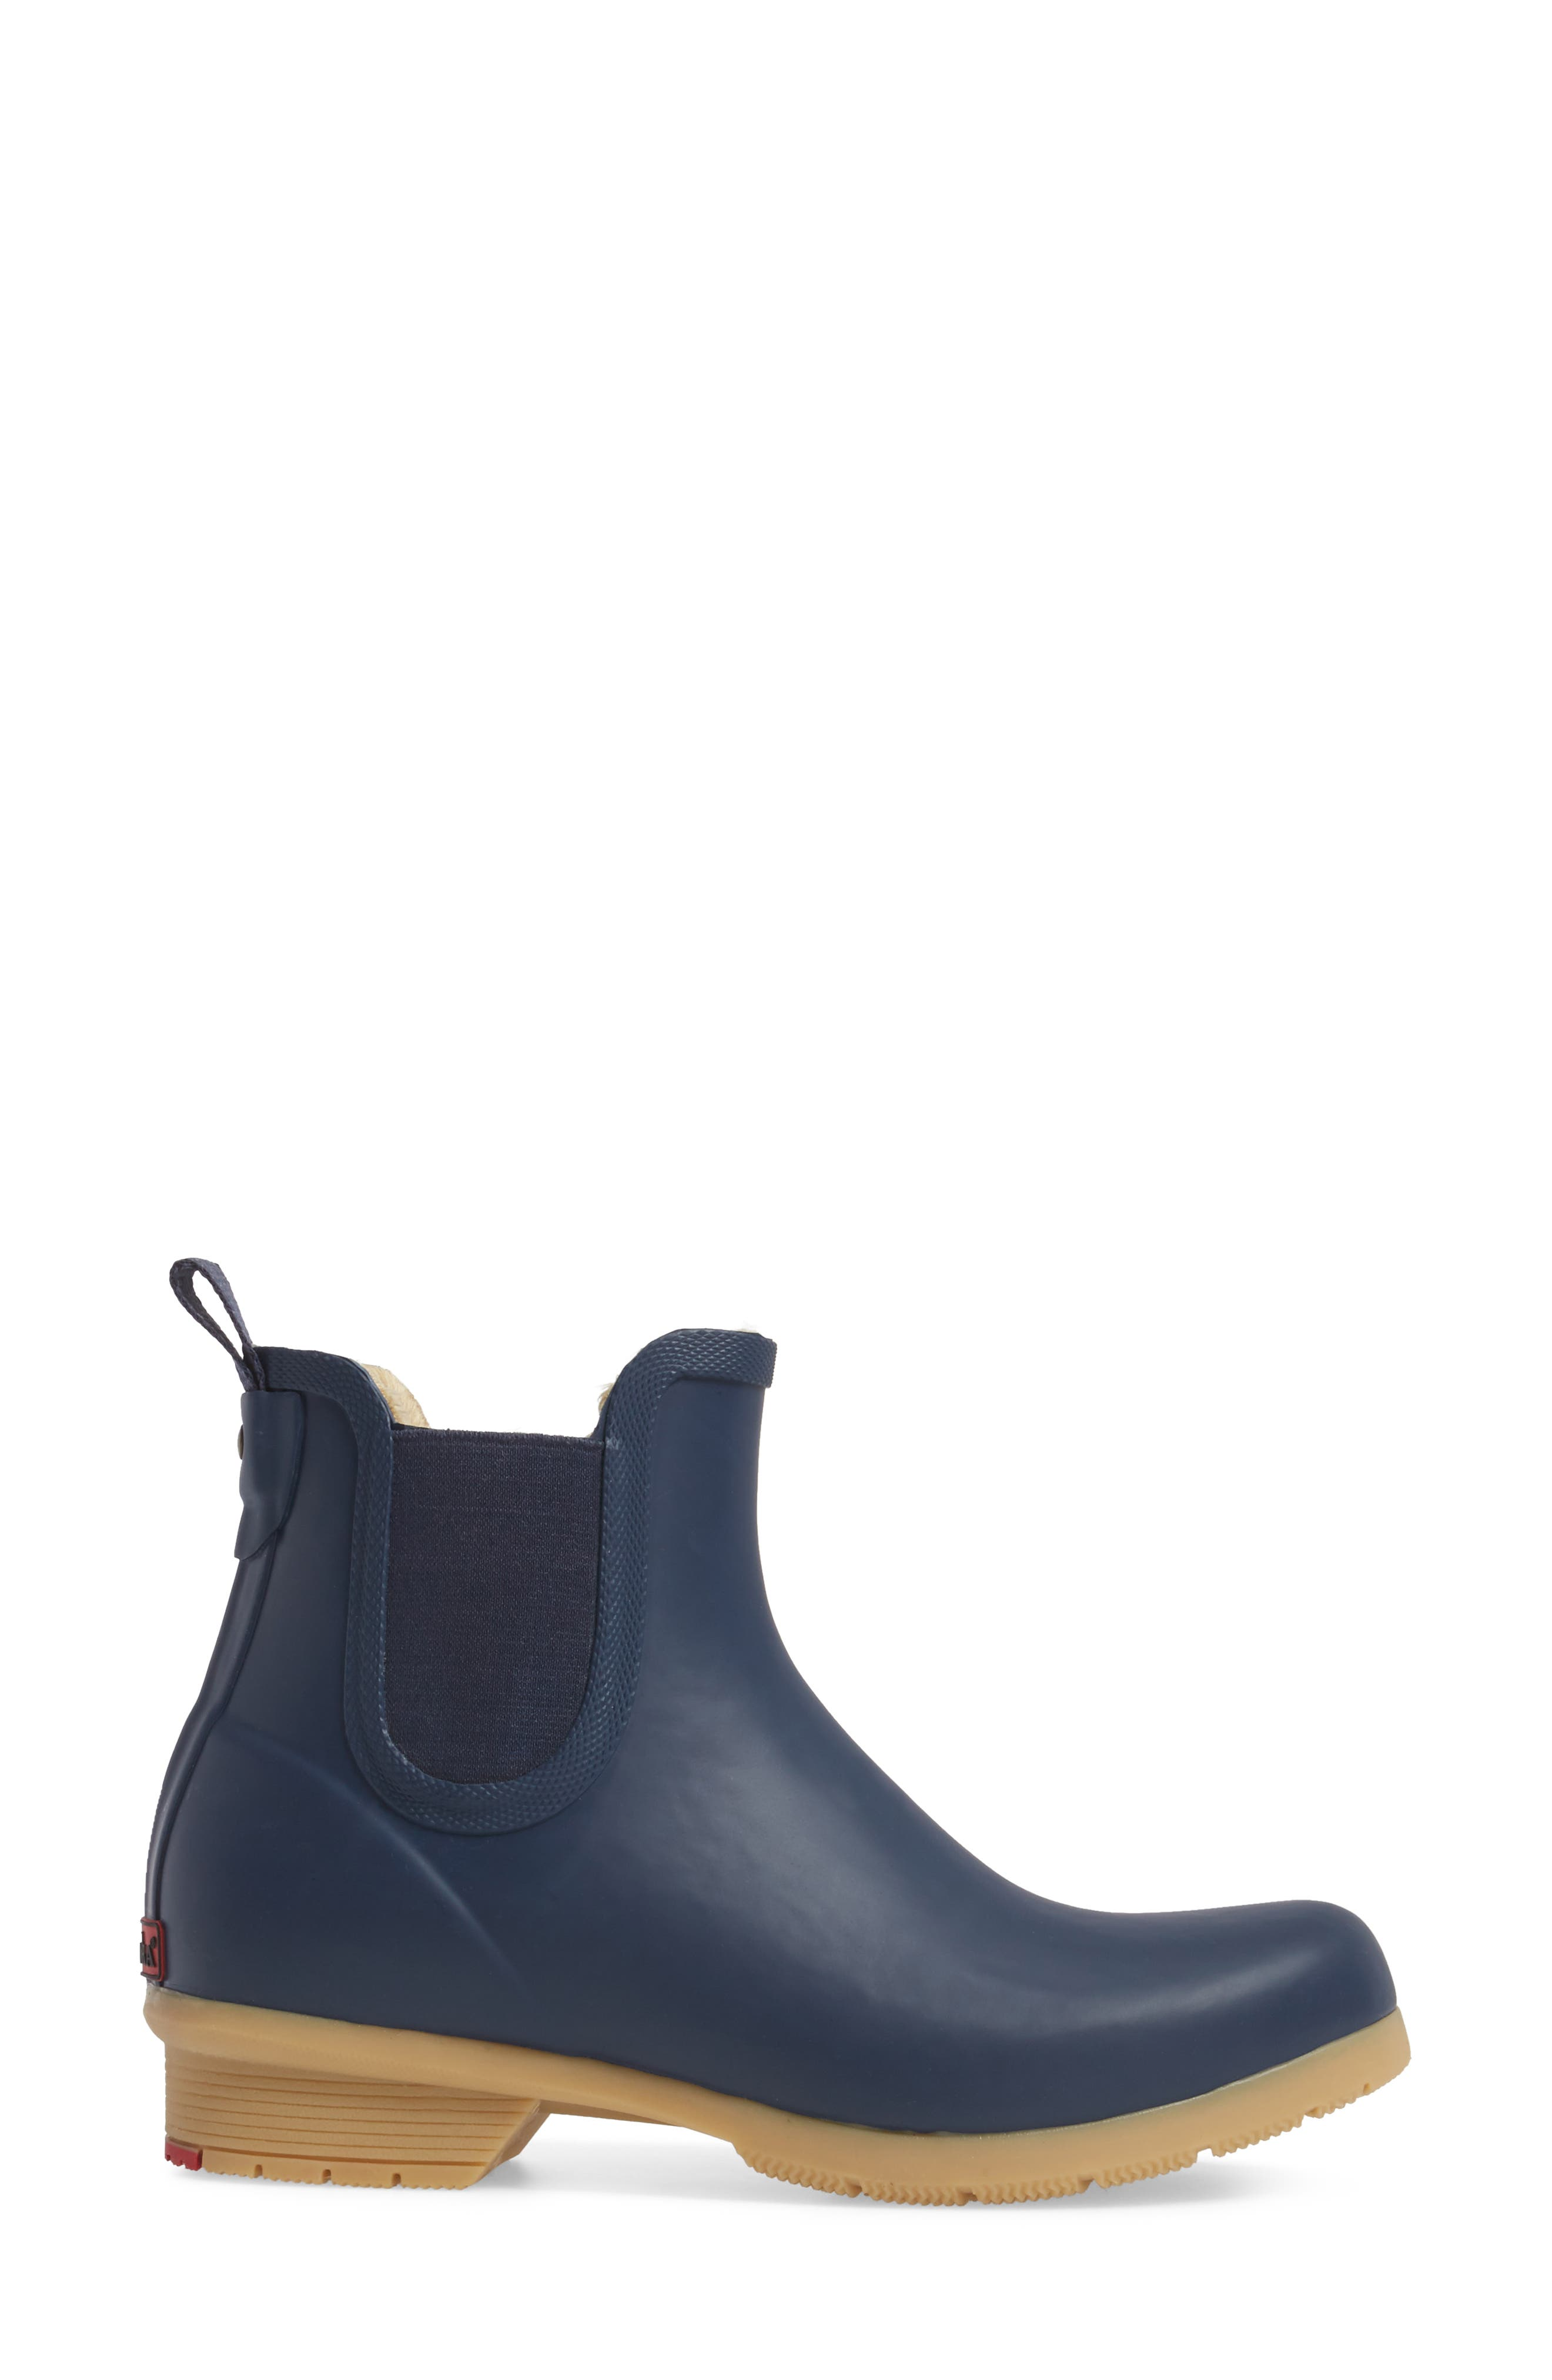 CHOOKA, Bainbridge Chelsea Rain Boot, Alternate thumbnail 3, color, NAVY